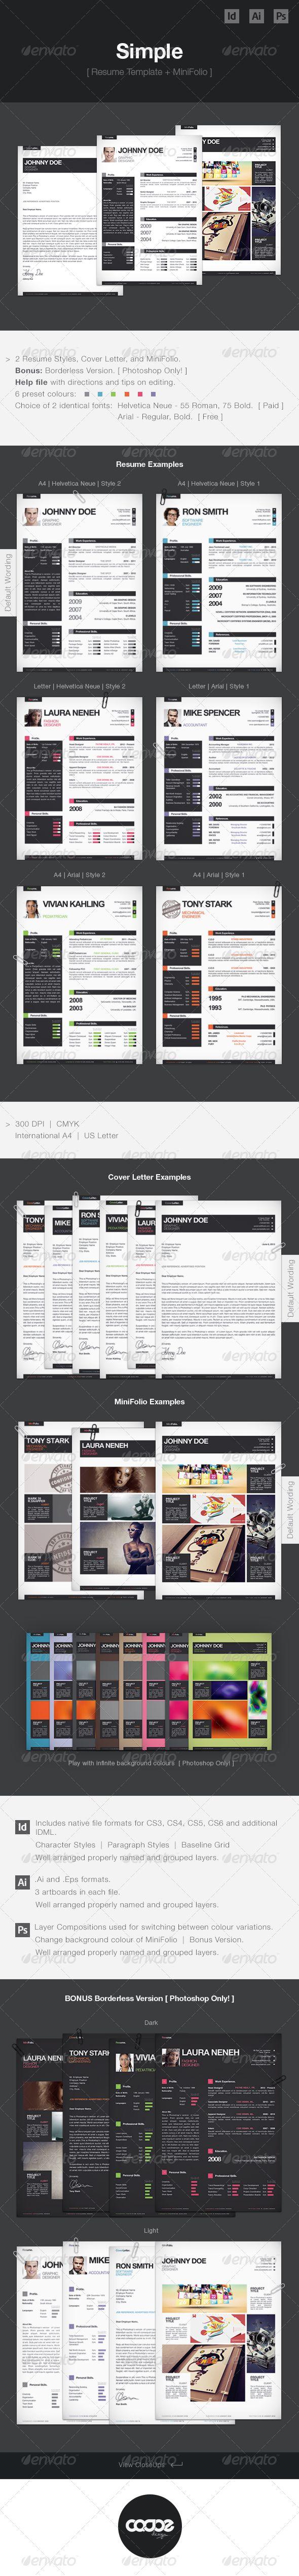 Simple Resume CV Template Mini